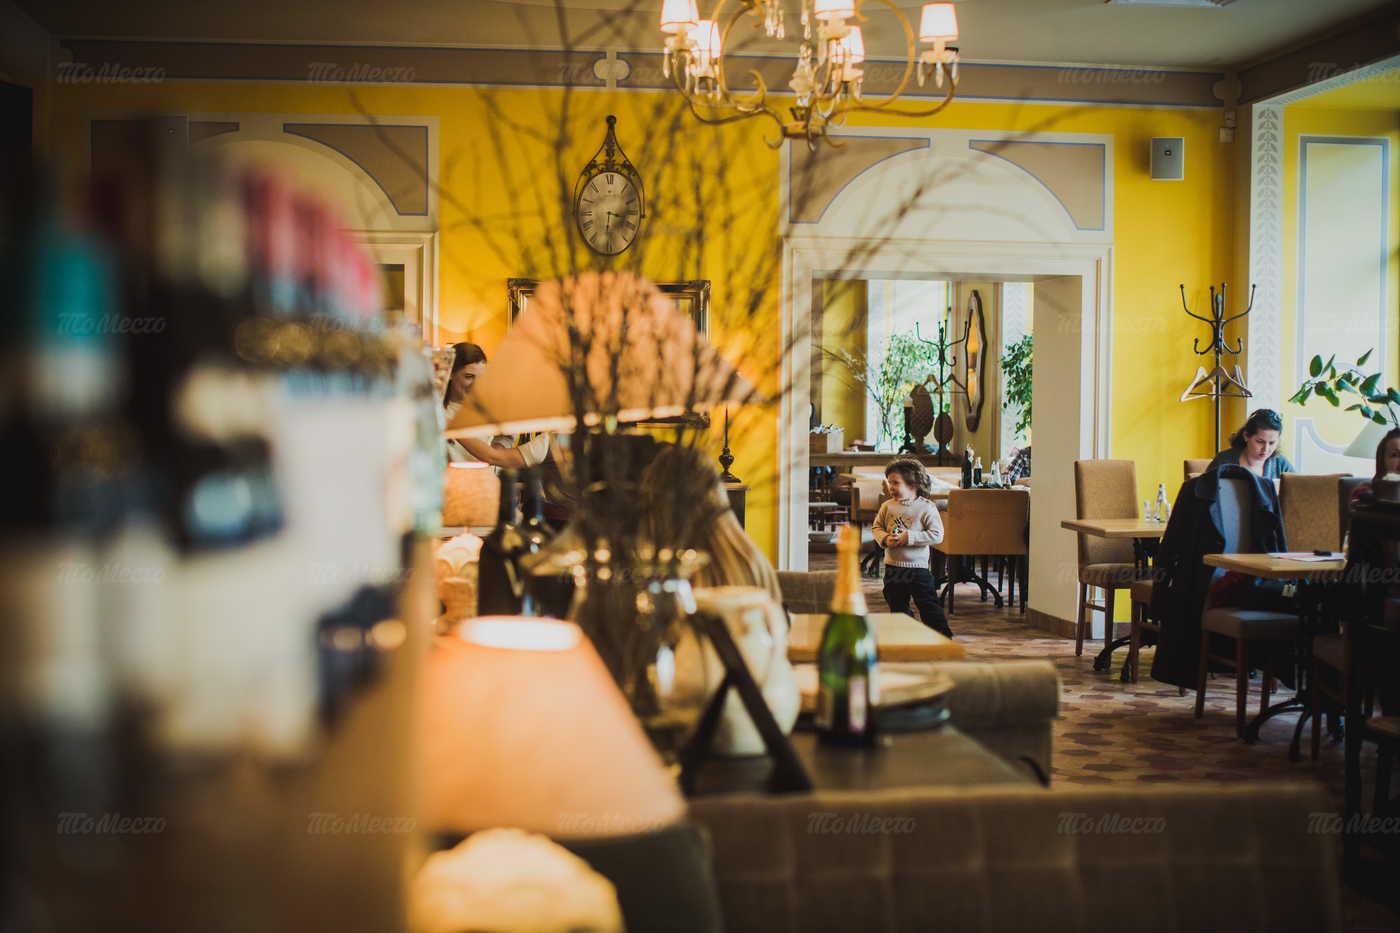 Меню ресторана Моццарелла бар (Mozzarella bar) на Малом проспекте П.С.